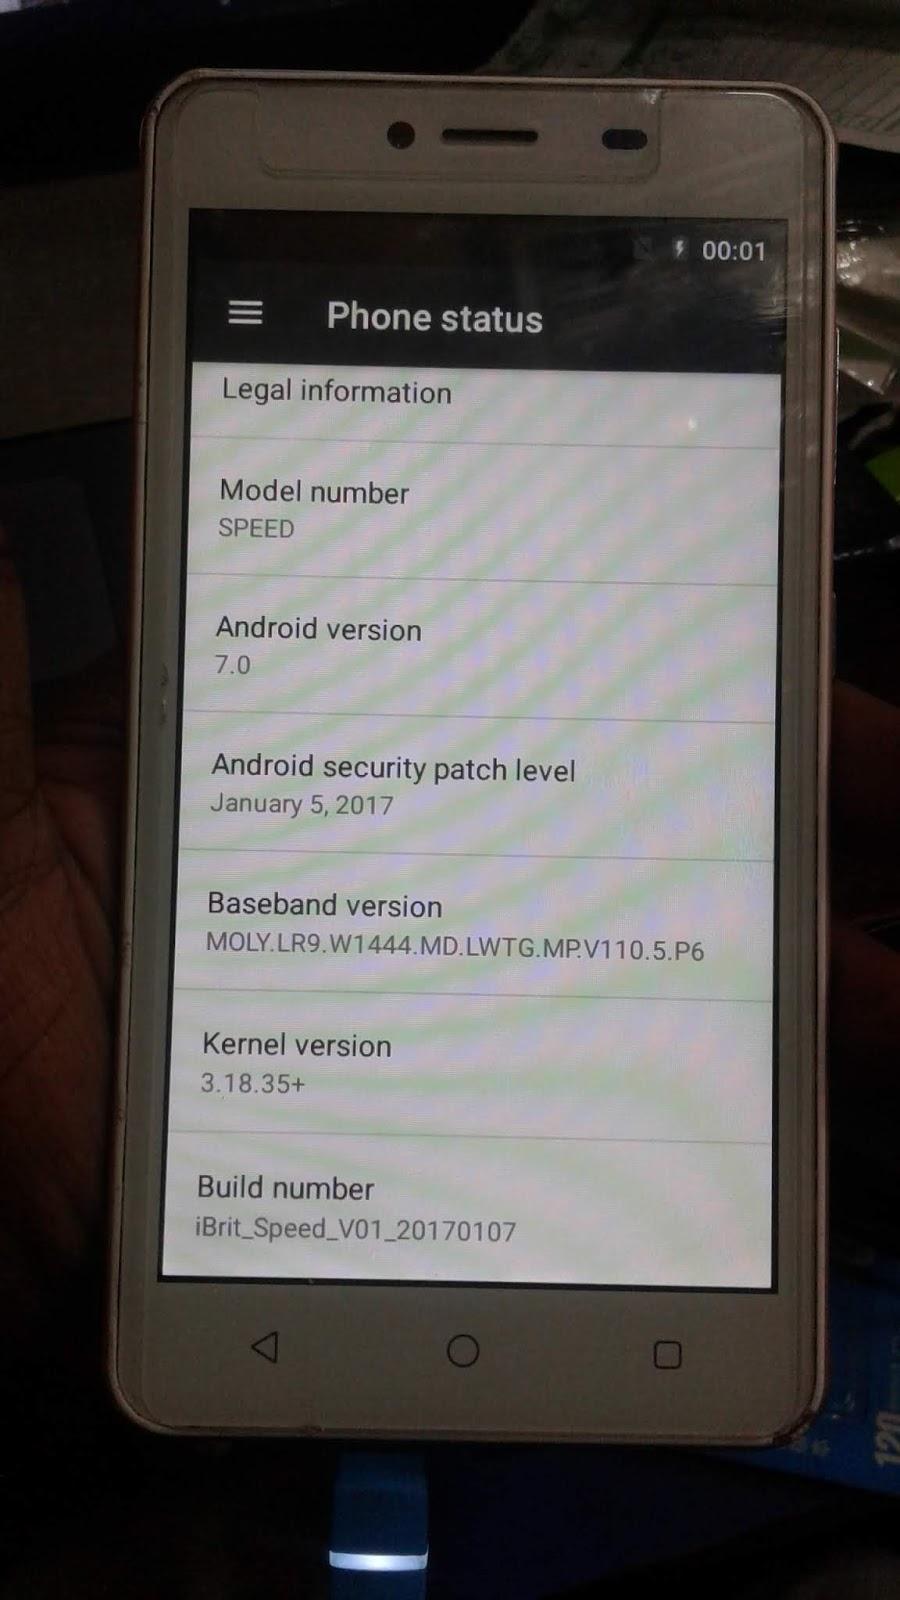 Robin Mobile Stk: iBrit Speed flash file